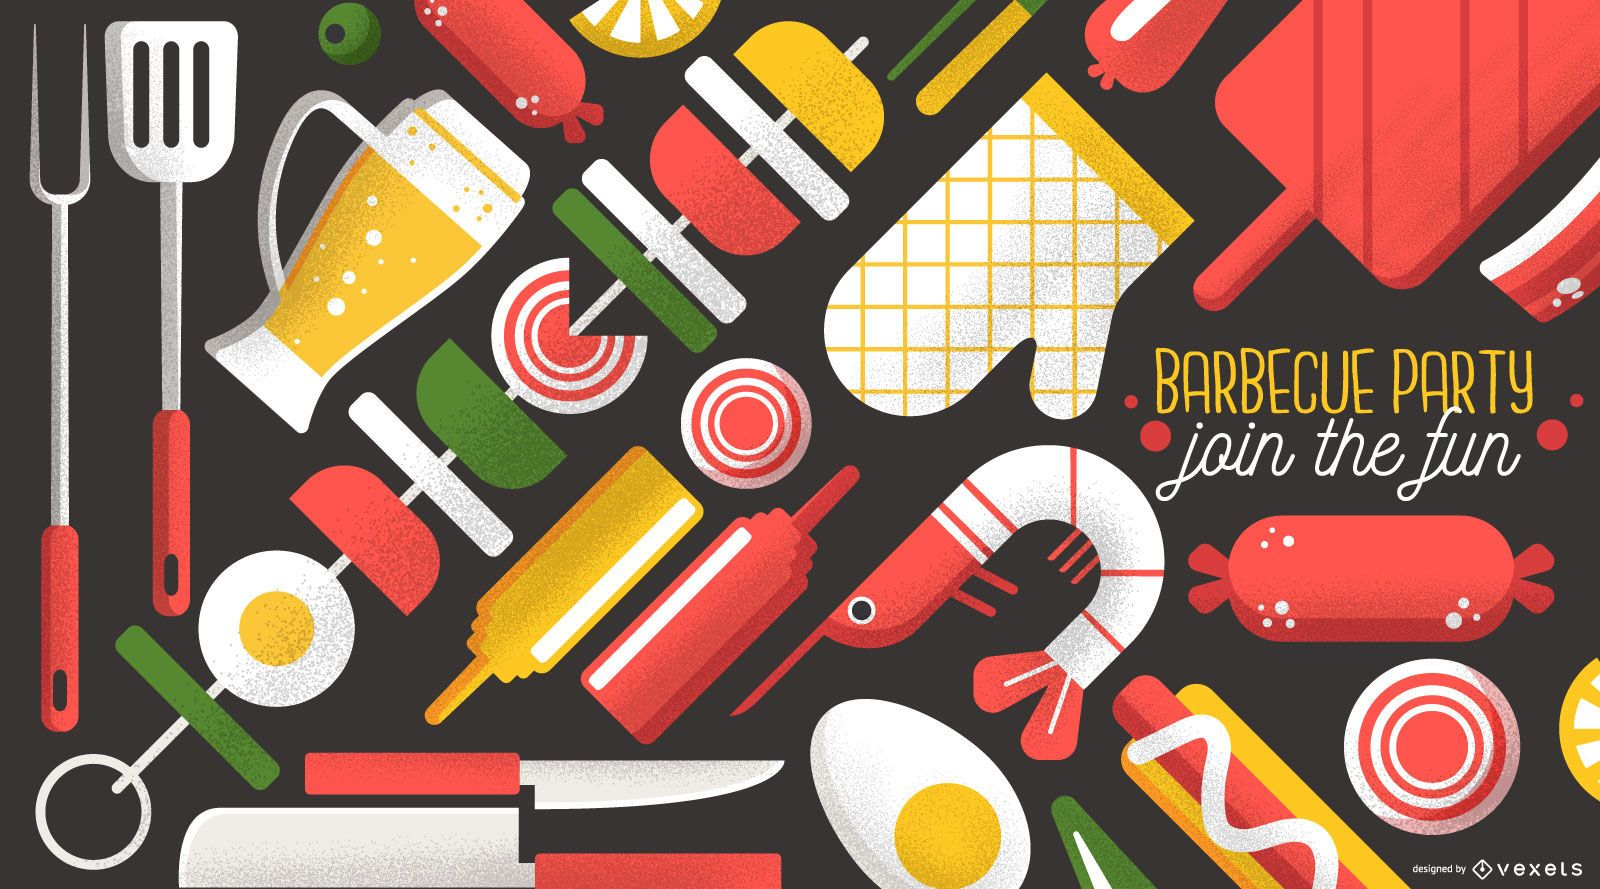 Barbecue Party Wallpaper Design